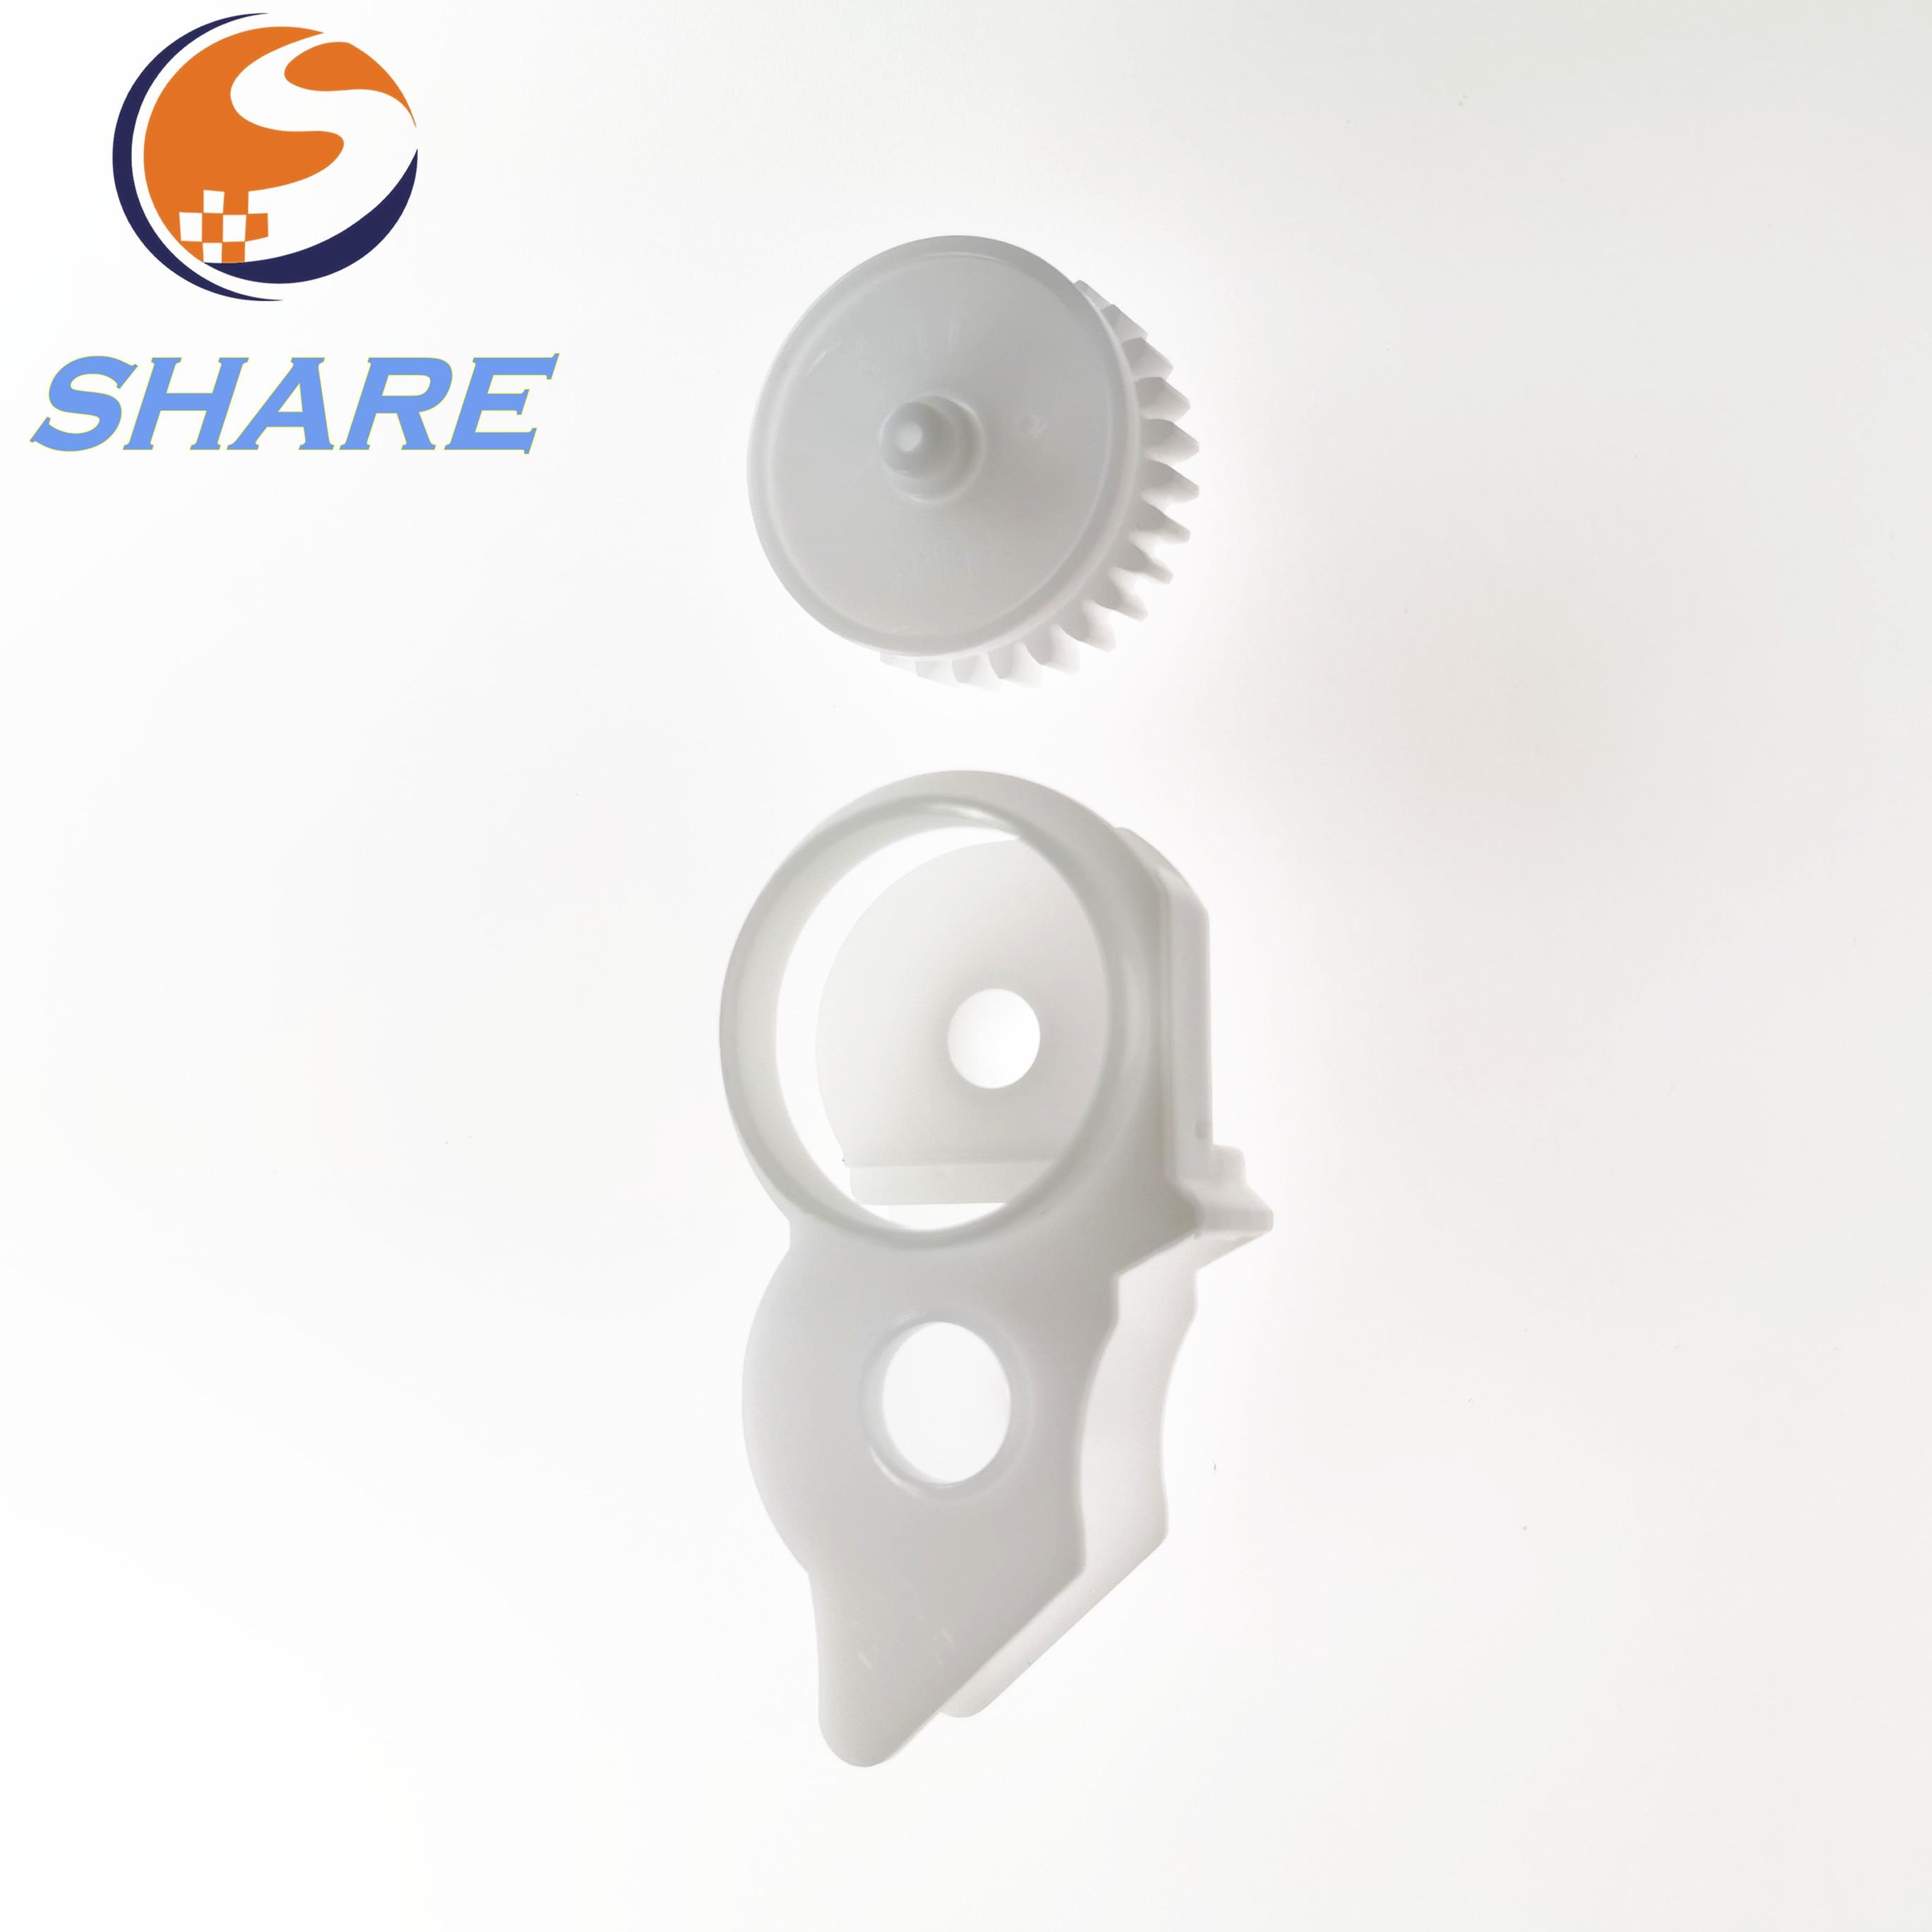 SHARE 1ps RC3-2511 RU7-0374 рычаг Поворотный драйвер Fuser Gear 29T для HP Pro 400 MFP M401 M425 M425dn M425dw M401a M401d